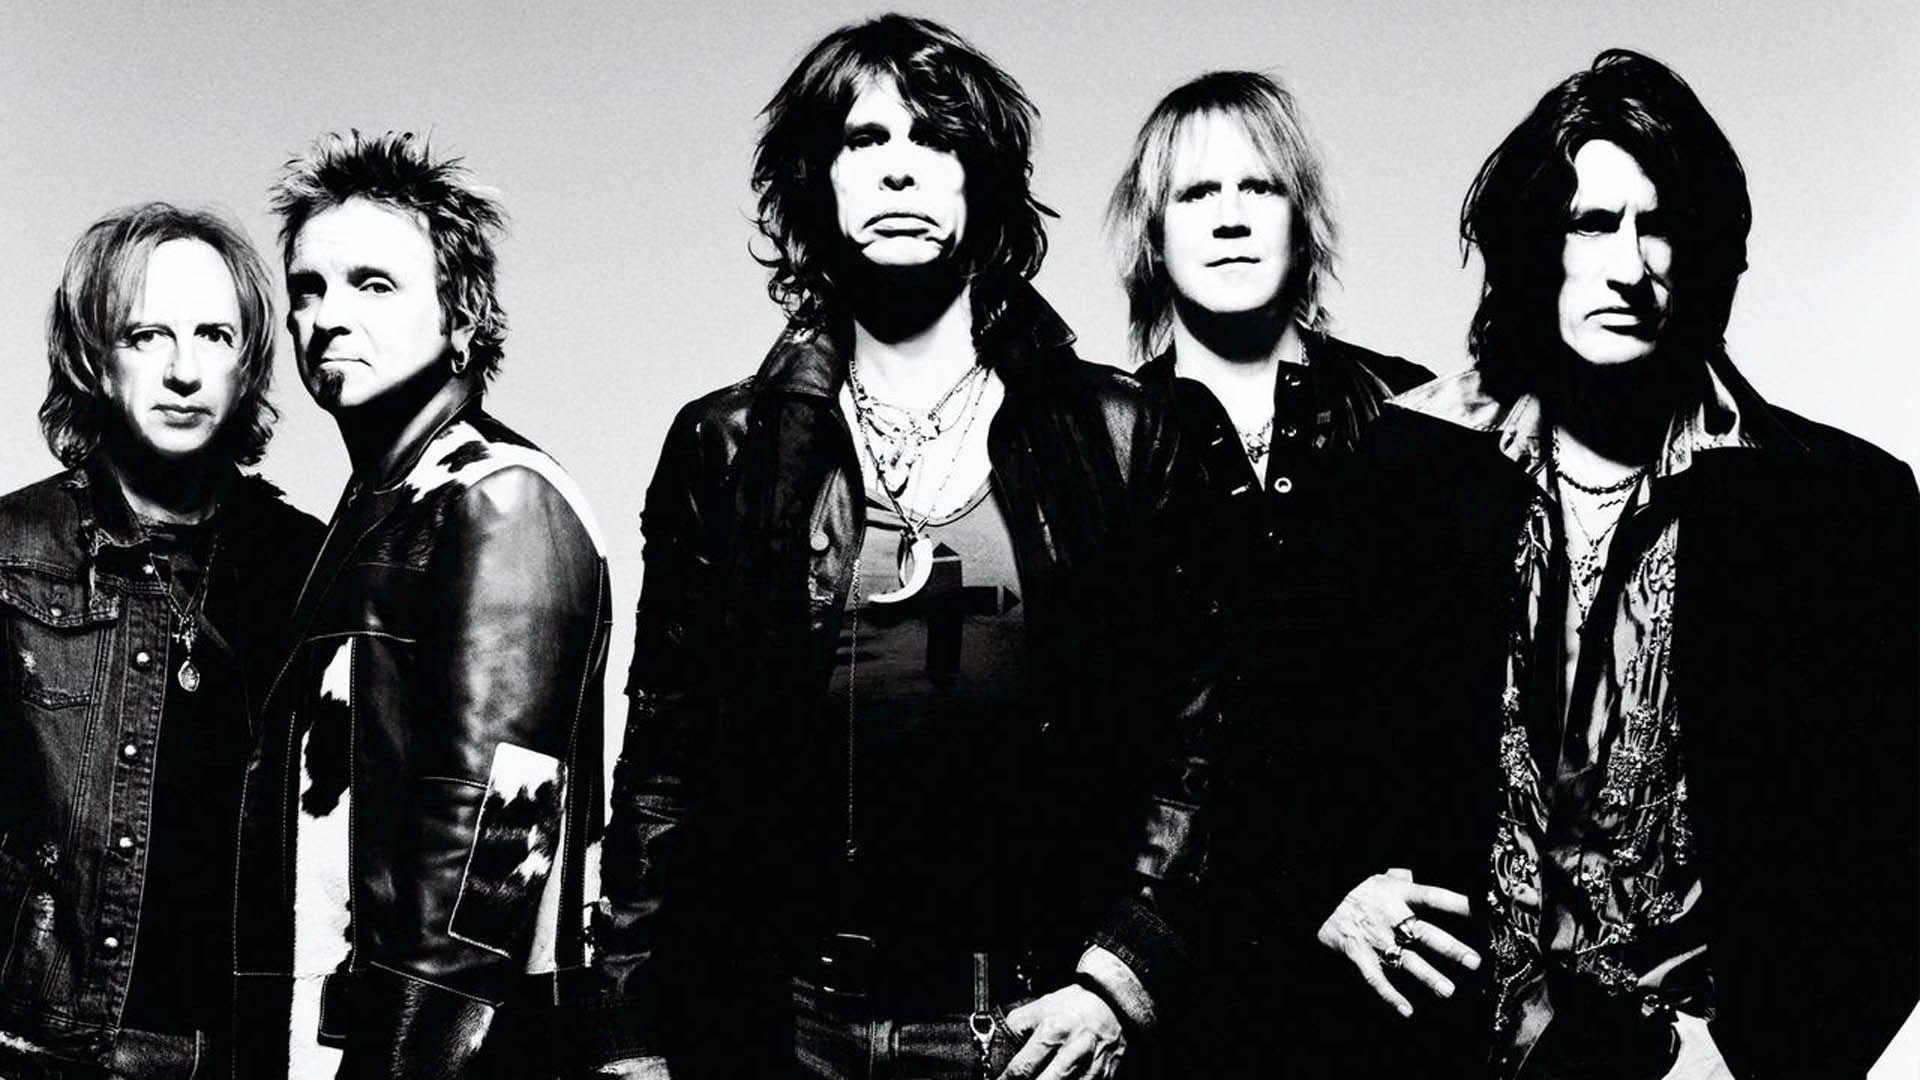 Black Aerosmith Wallpaper